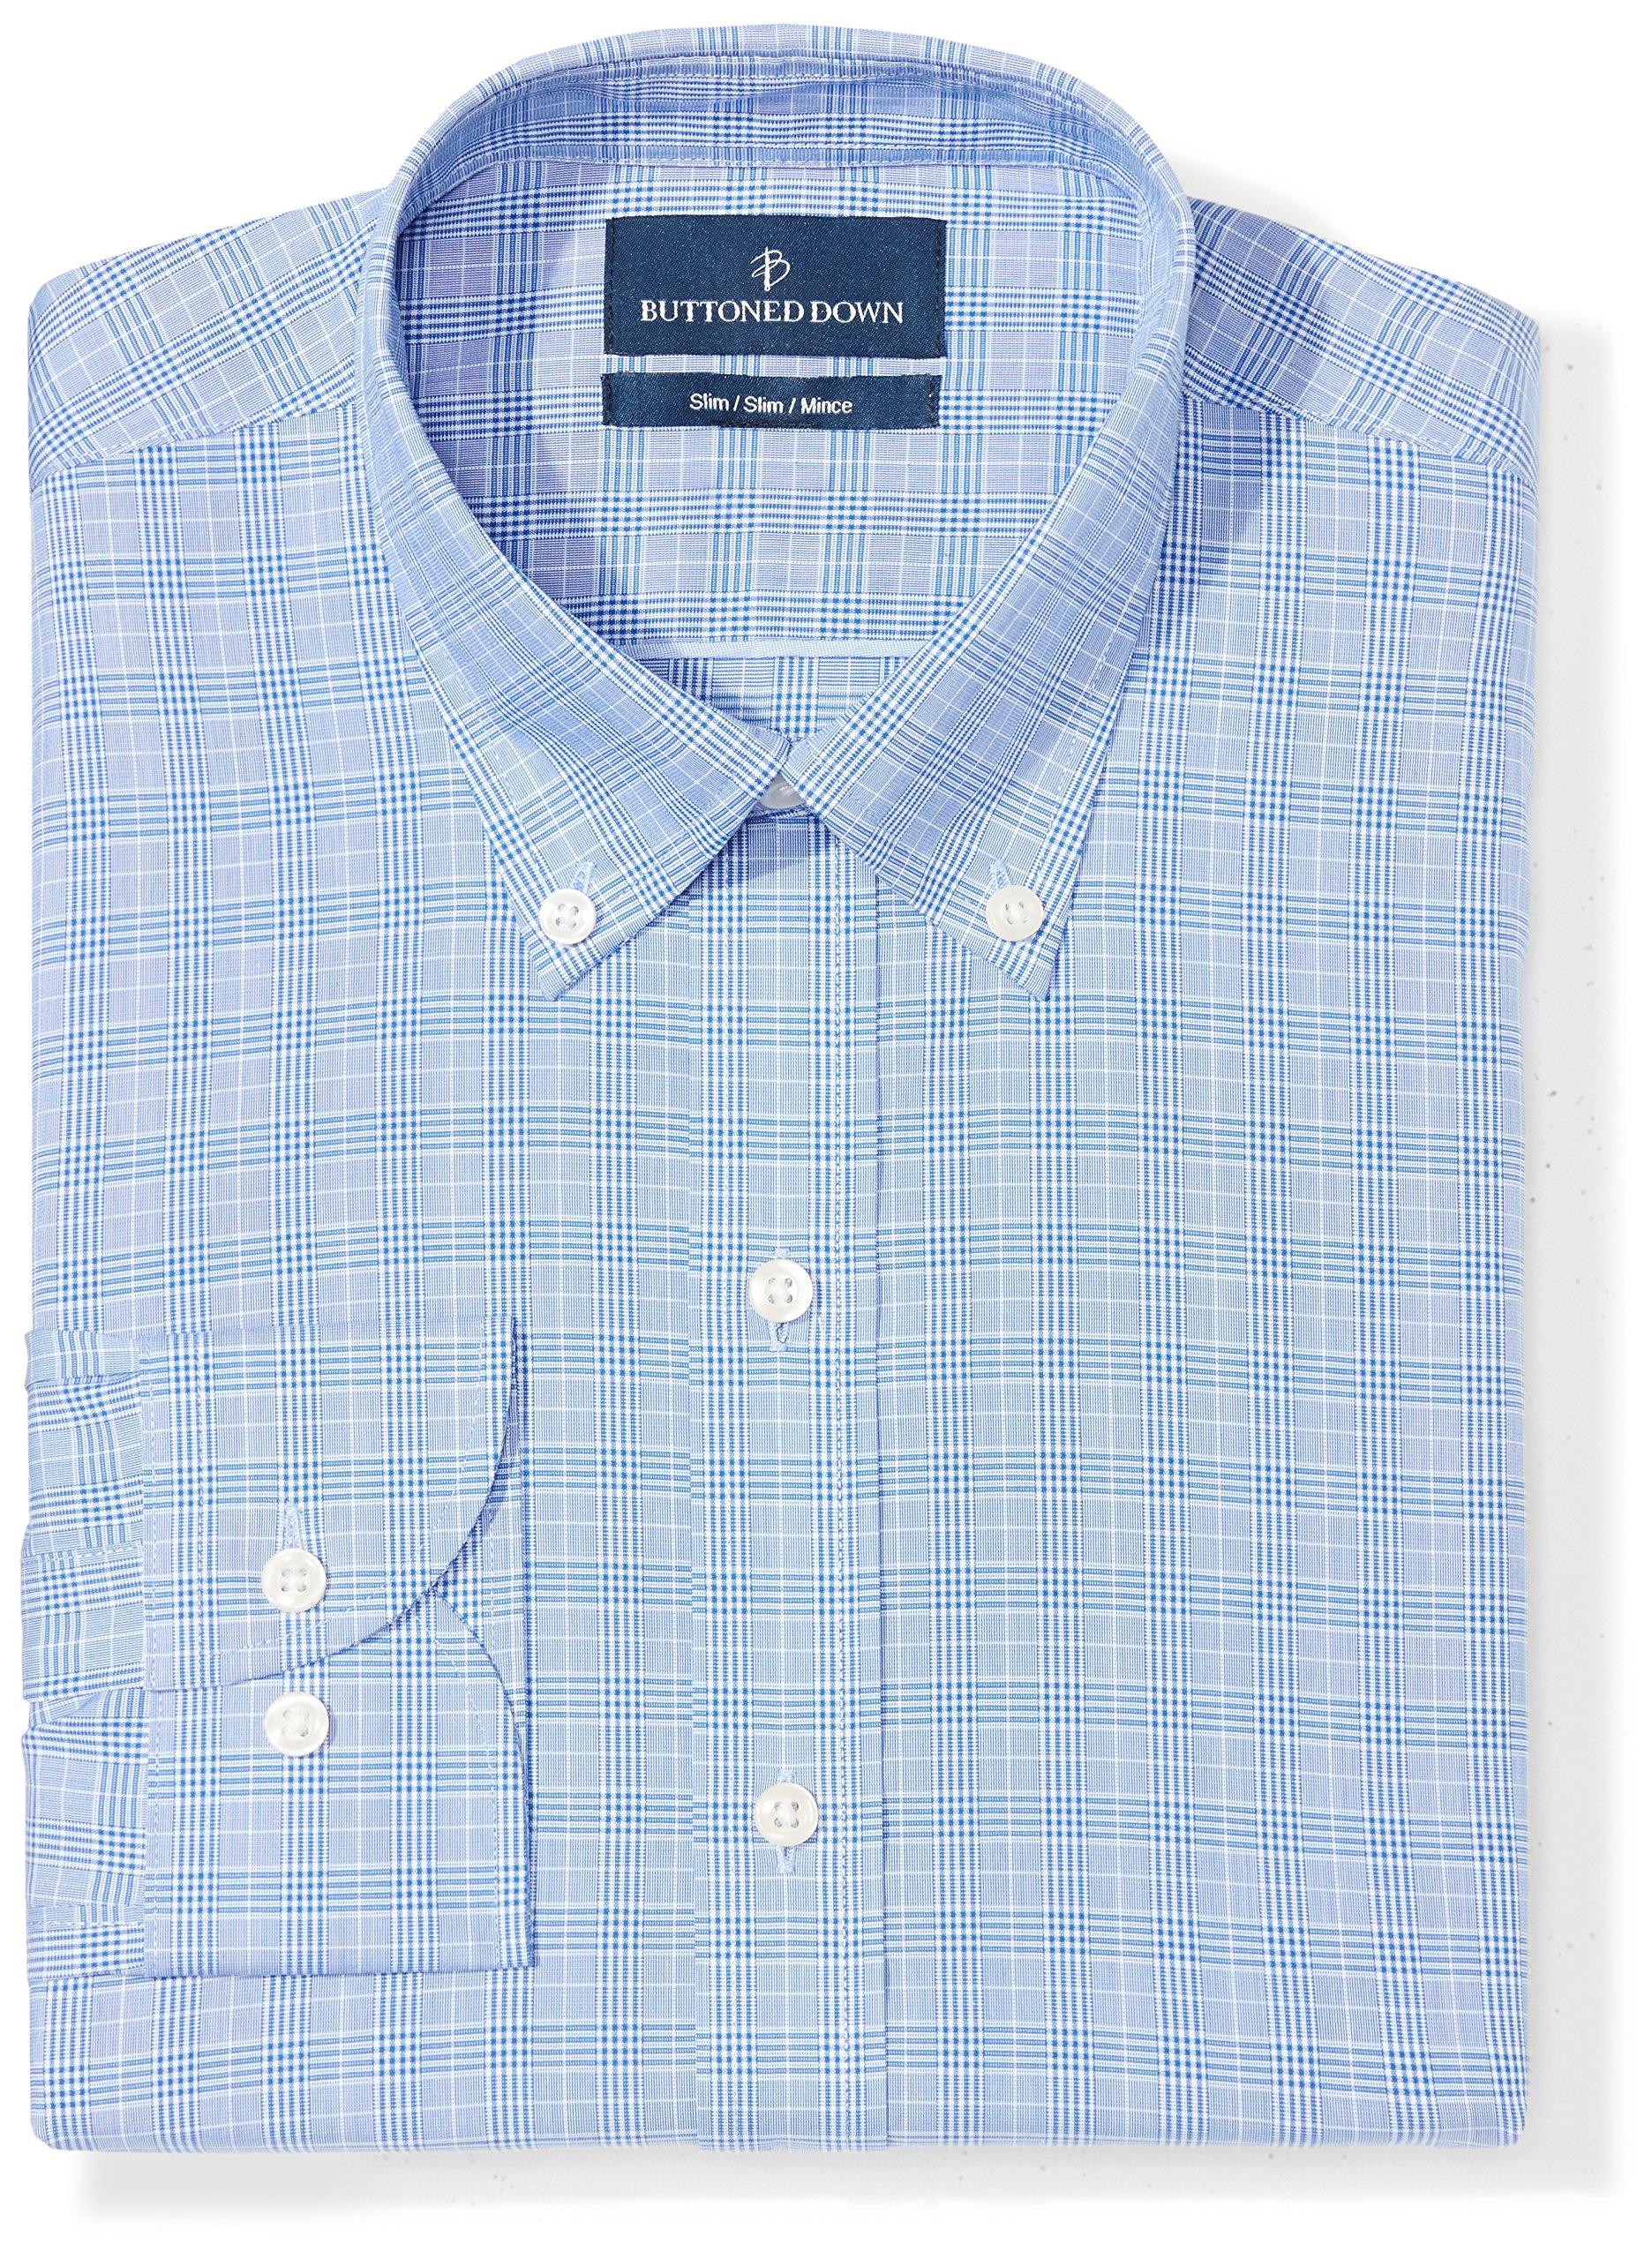 Buttoned Down Men's Slim Fit Button-Collar Pattern Non-Iron Dress Shirt, Blue Glen Plaid, 16'' Neck 36'' Sleeve